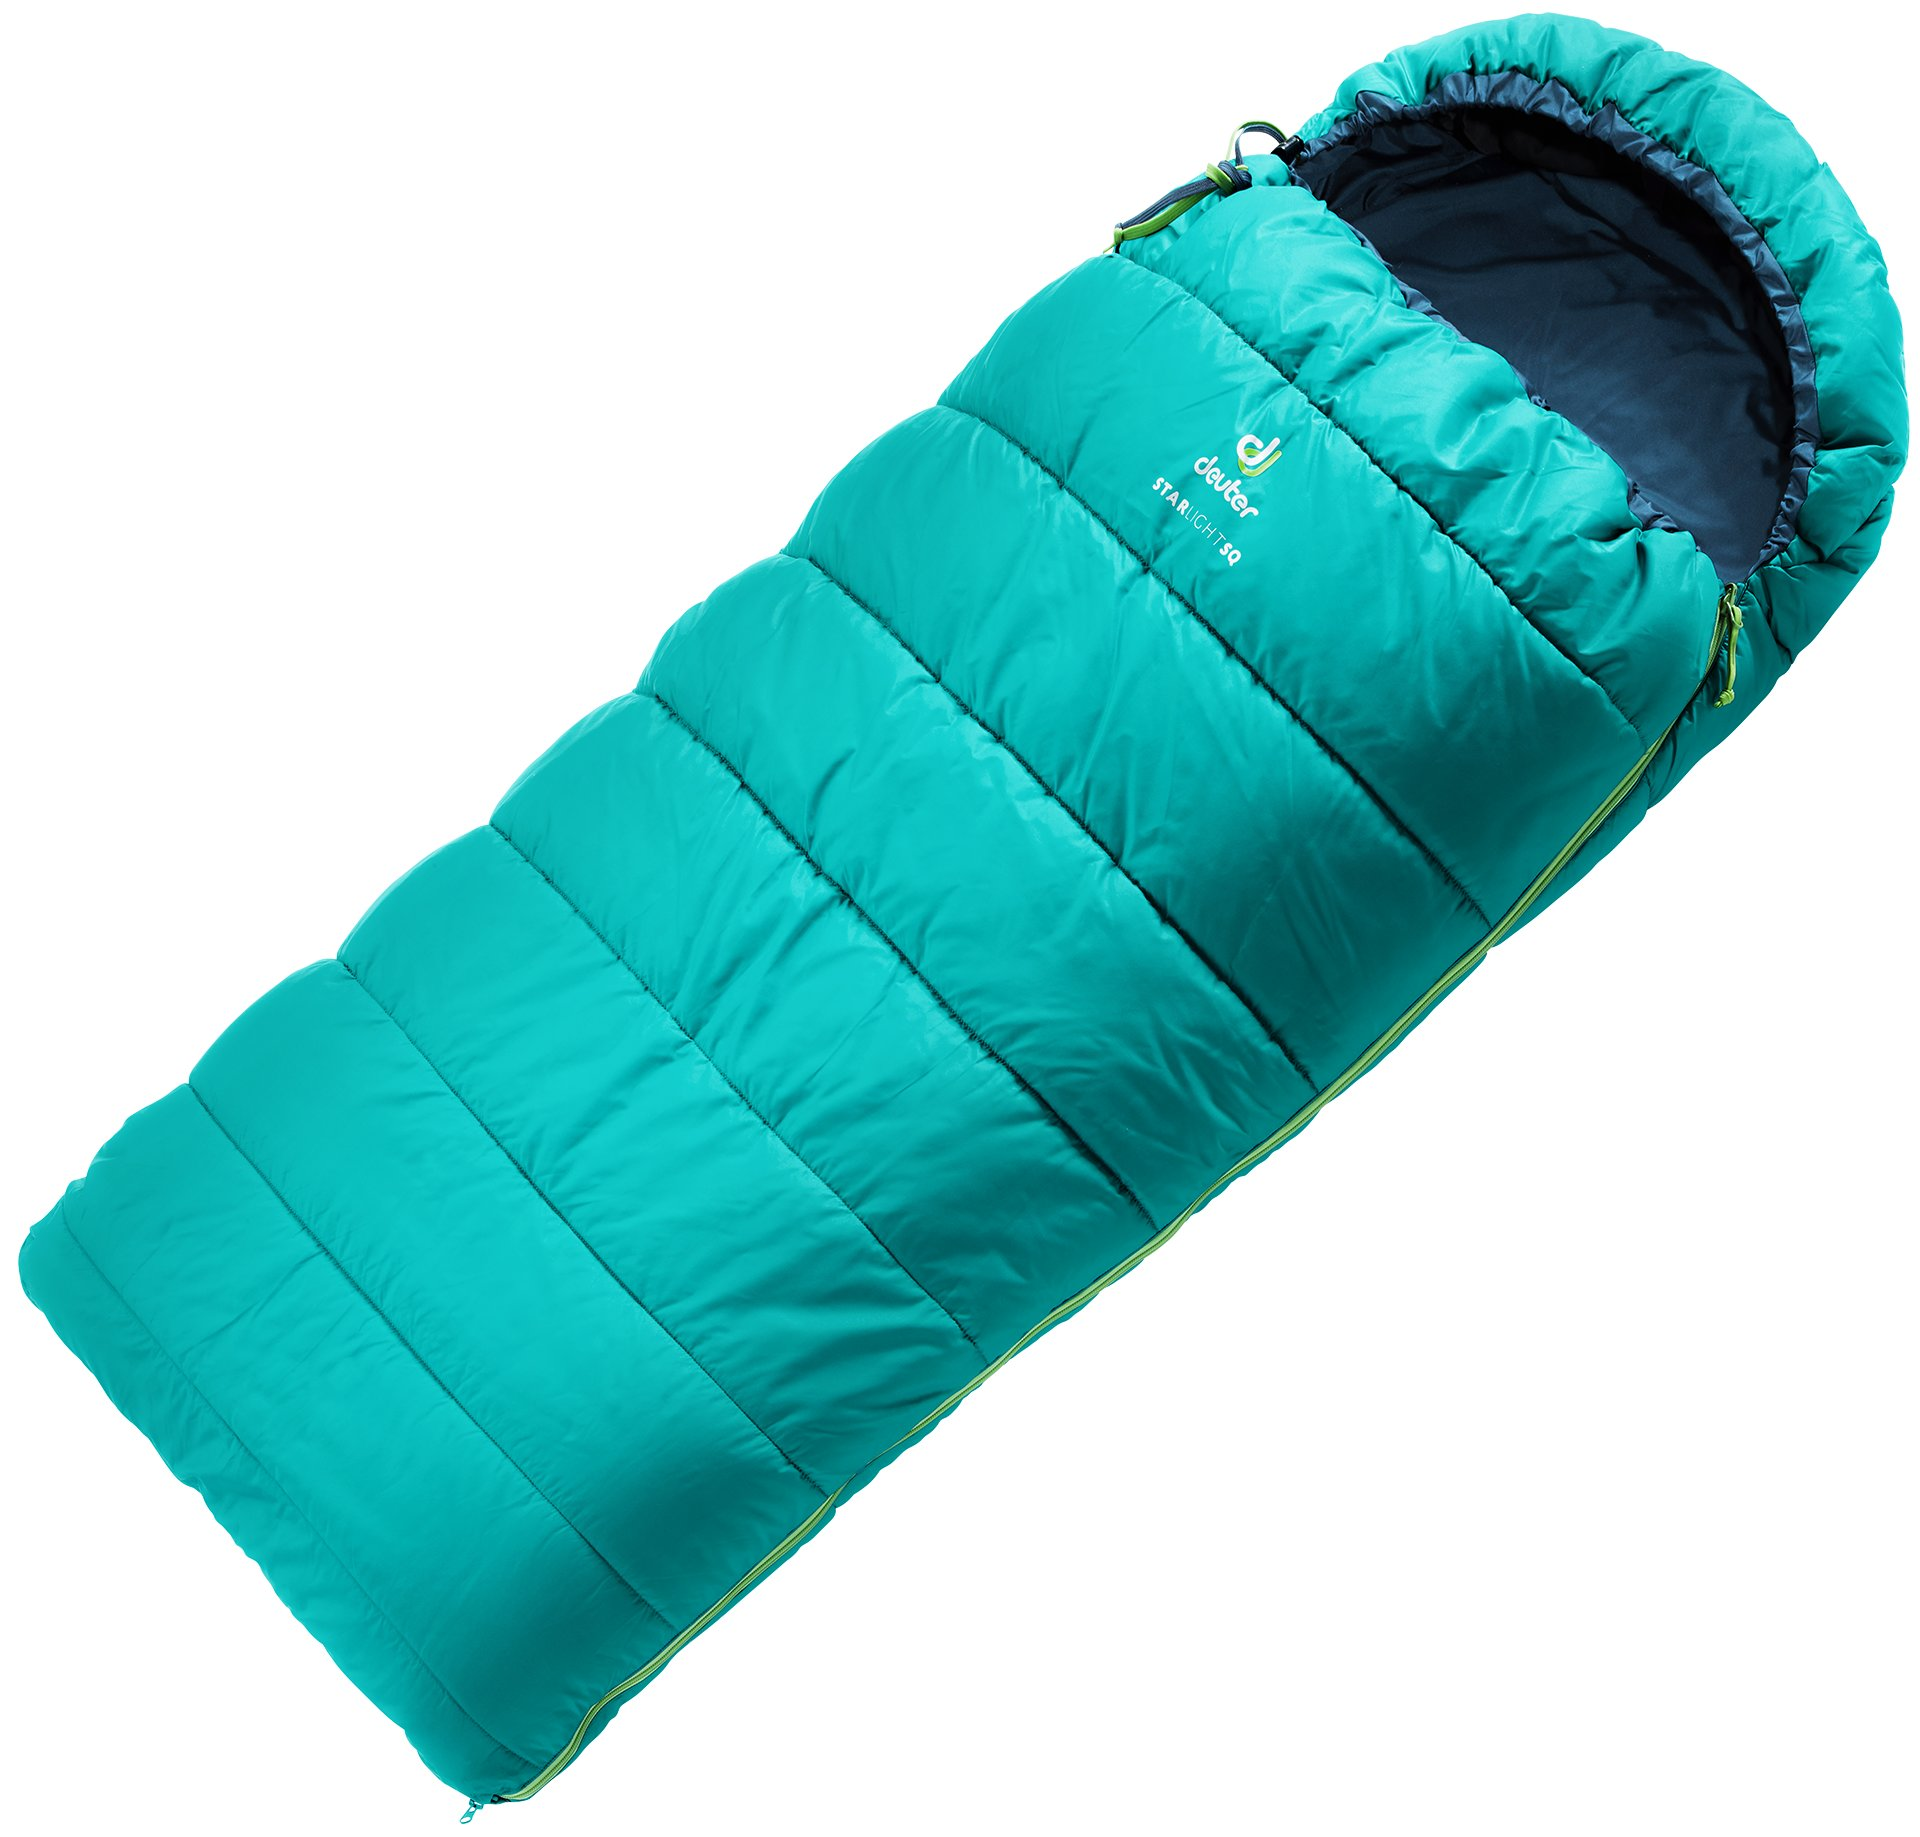 Deuter - Starlight SQ, Kinderschlafsack